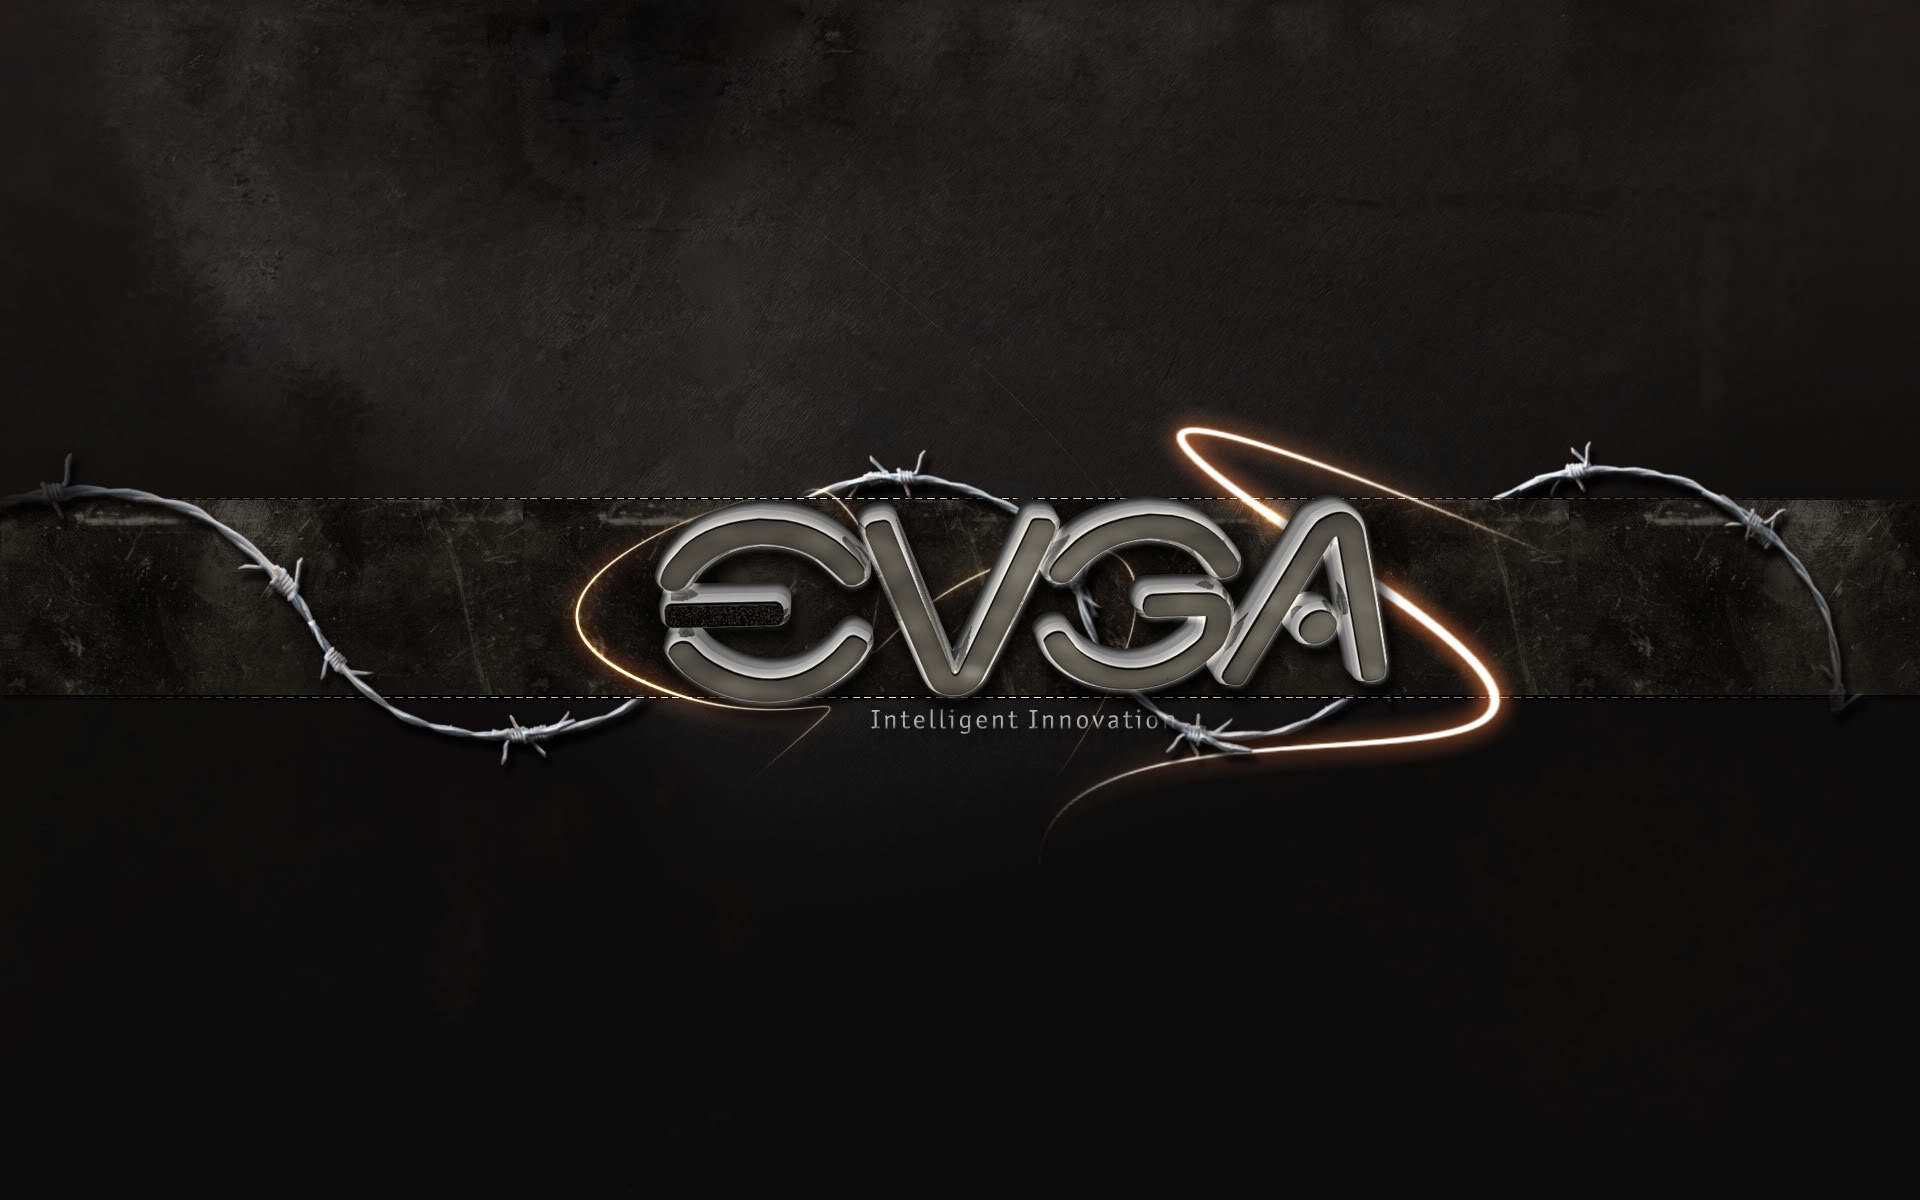 EVGA wallpapers + avatars - EVGA Forums